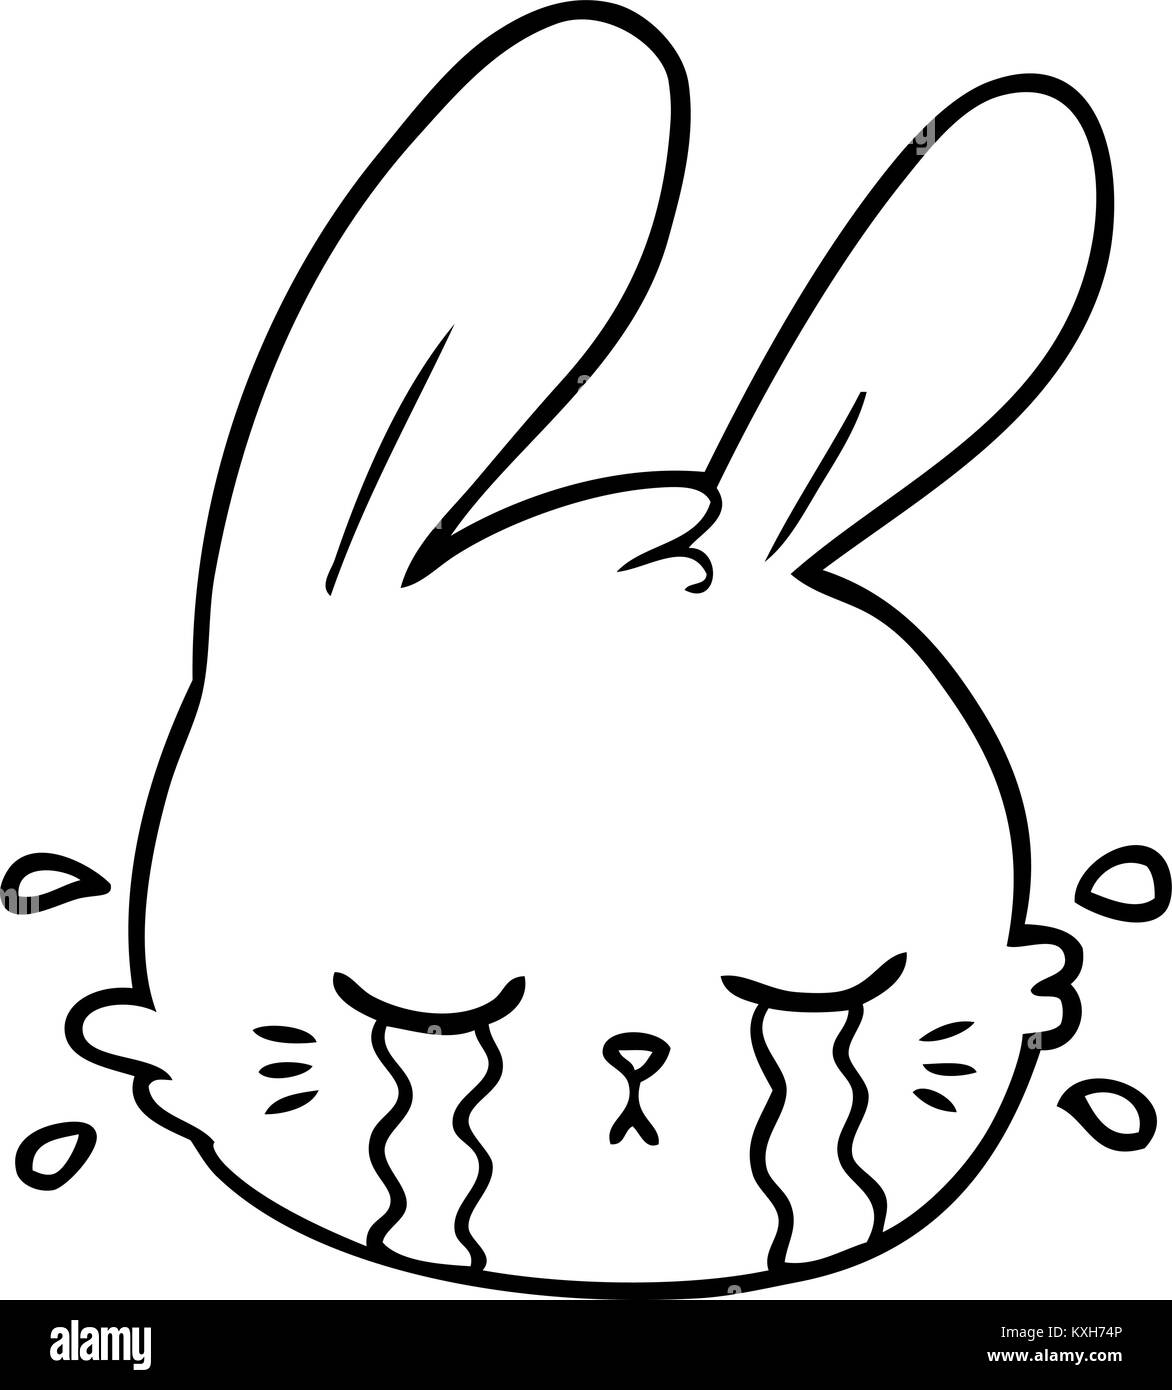 Cartoon Rabbit Face Crying Stock Vector Art Illustration Vector